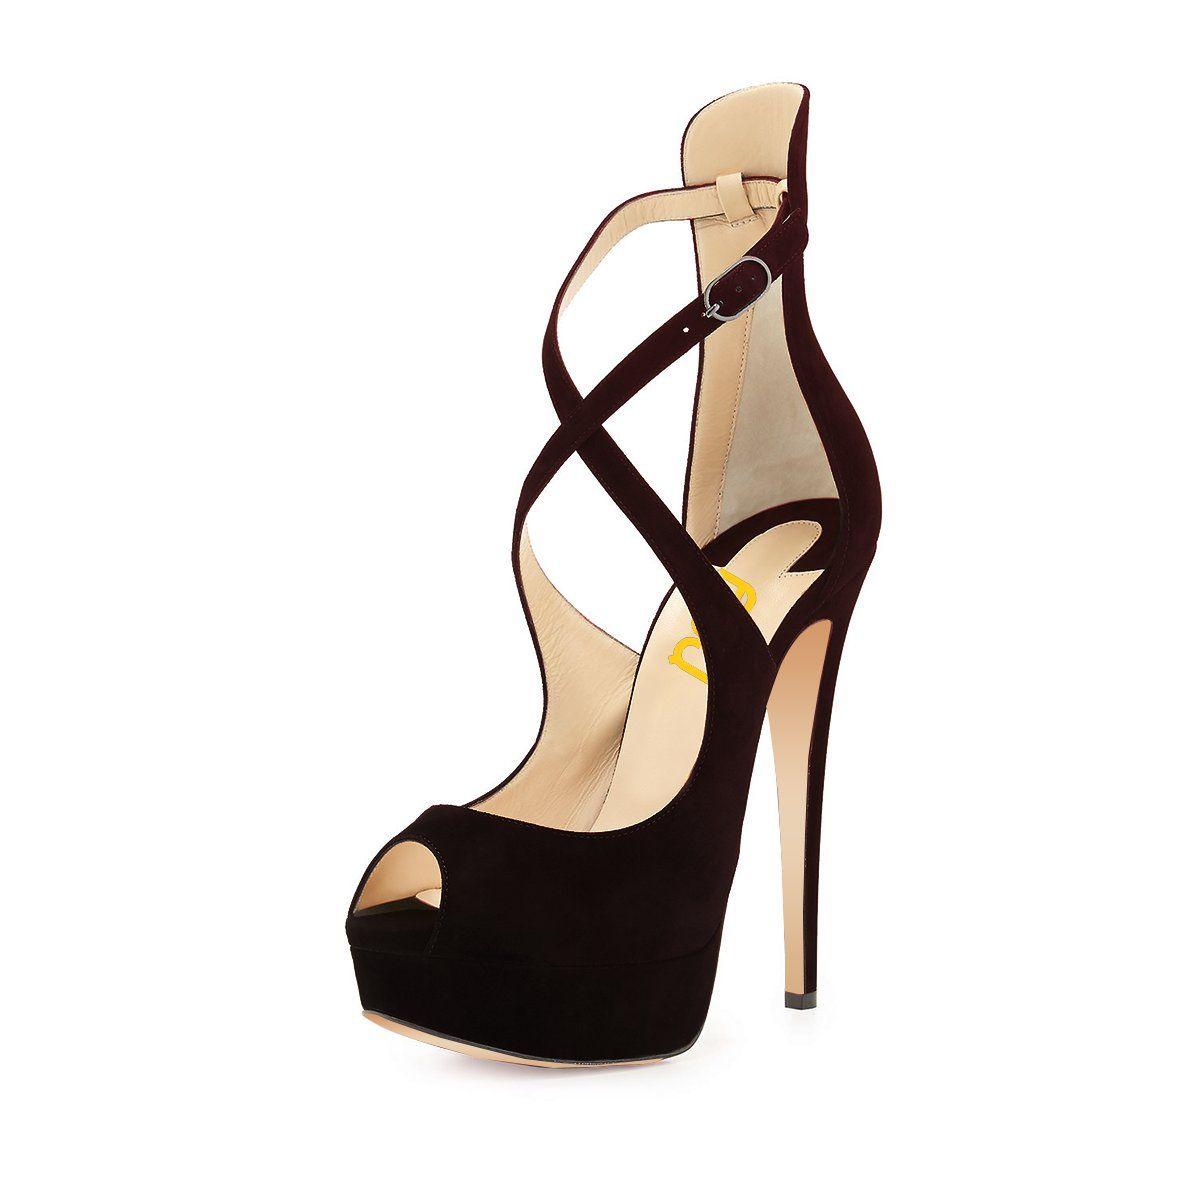 7e1dd34ad95 While Supplies Last Black Peep Toe Heels Suede Stilettos Cross-over Strap Platform  Sandals  elegantshoegirl  shoes  ankle  boots  flats  fashions  womens